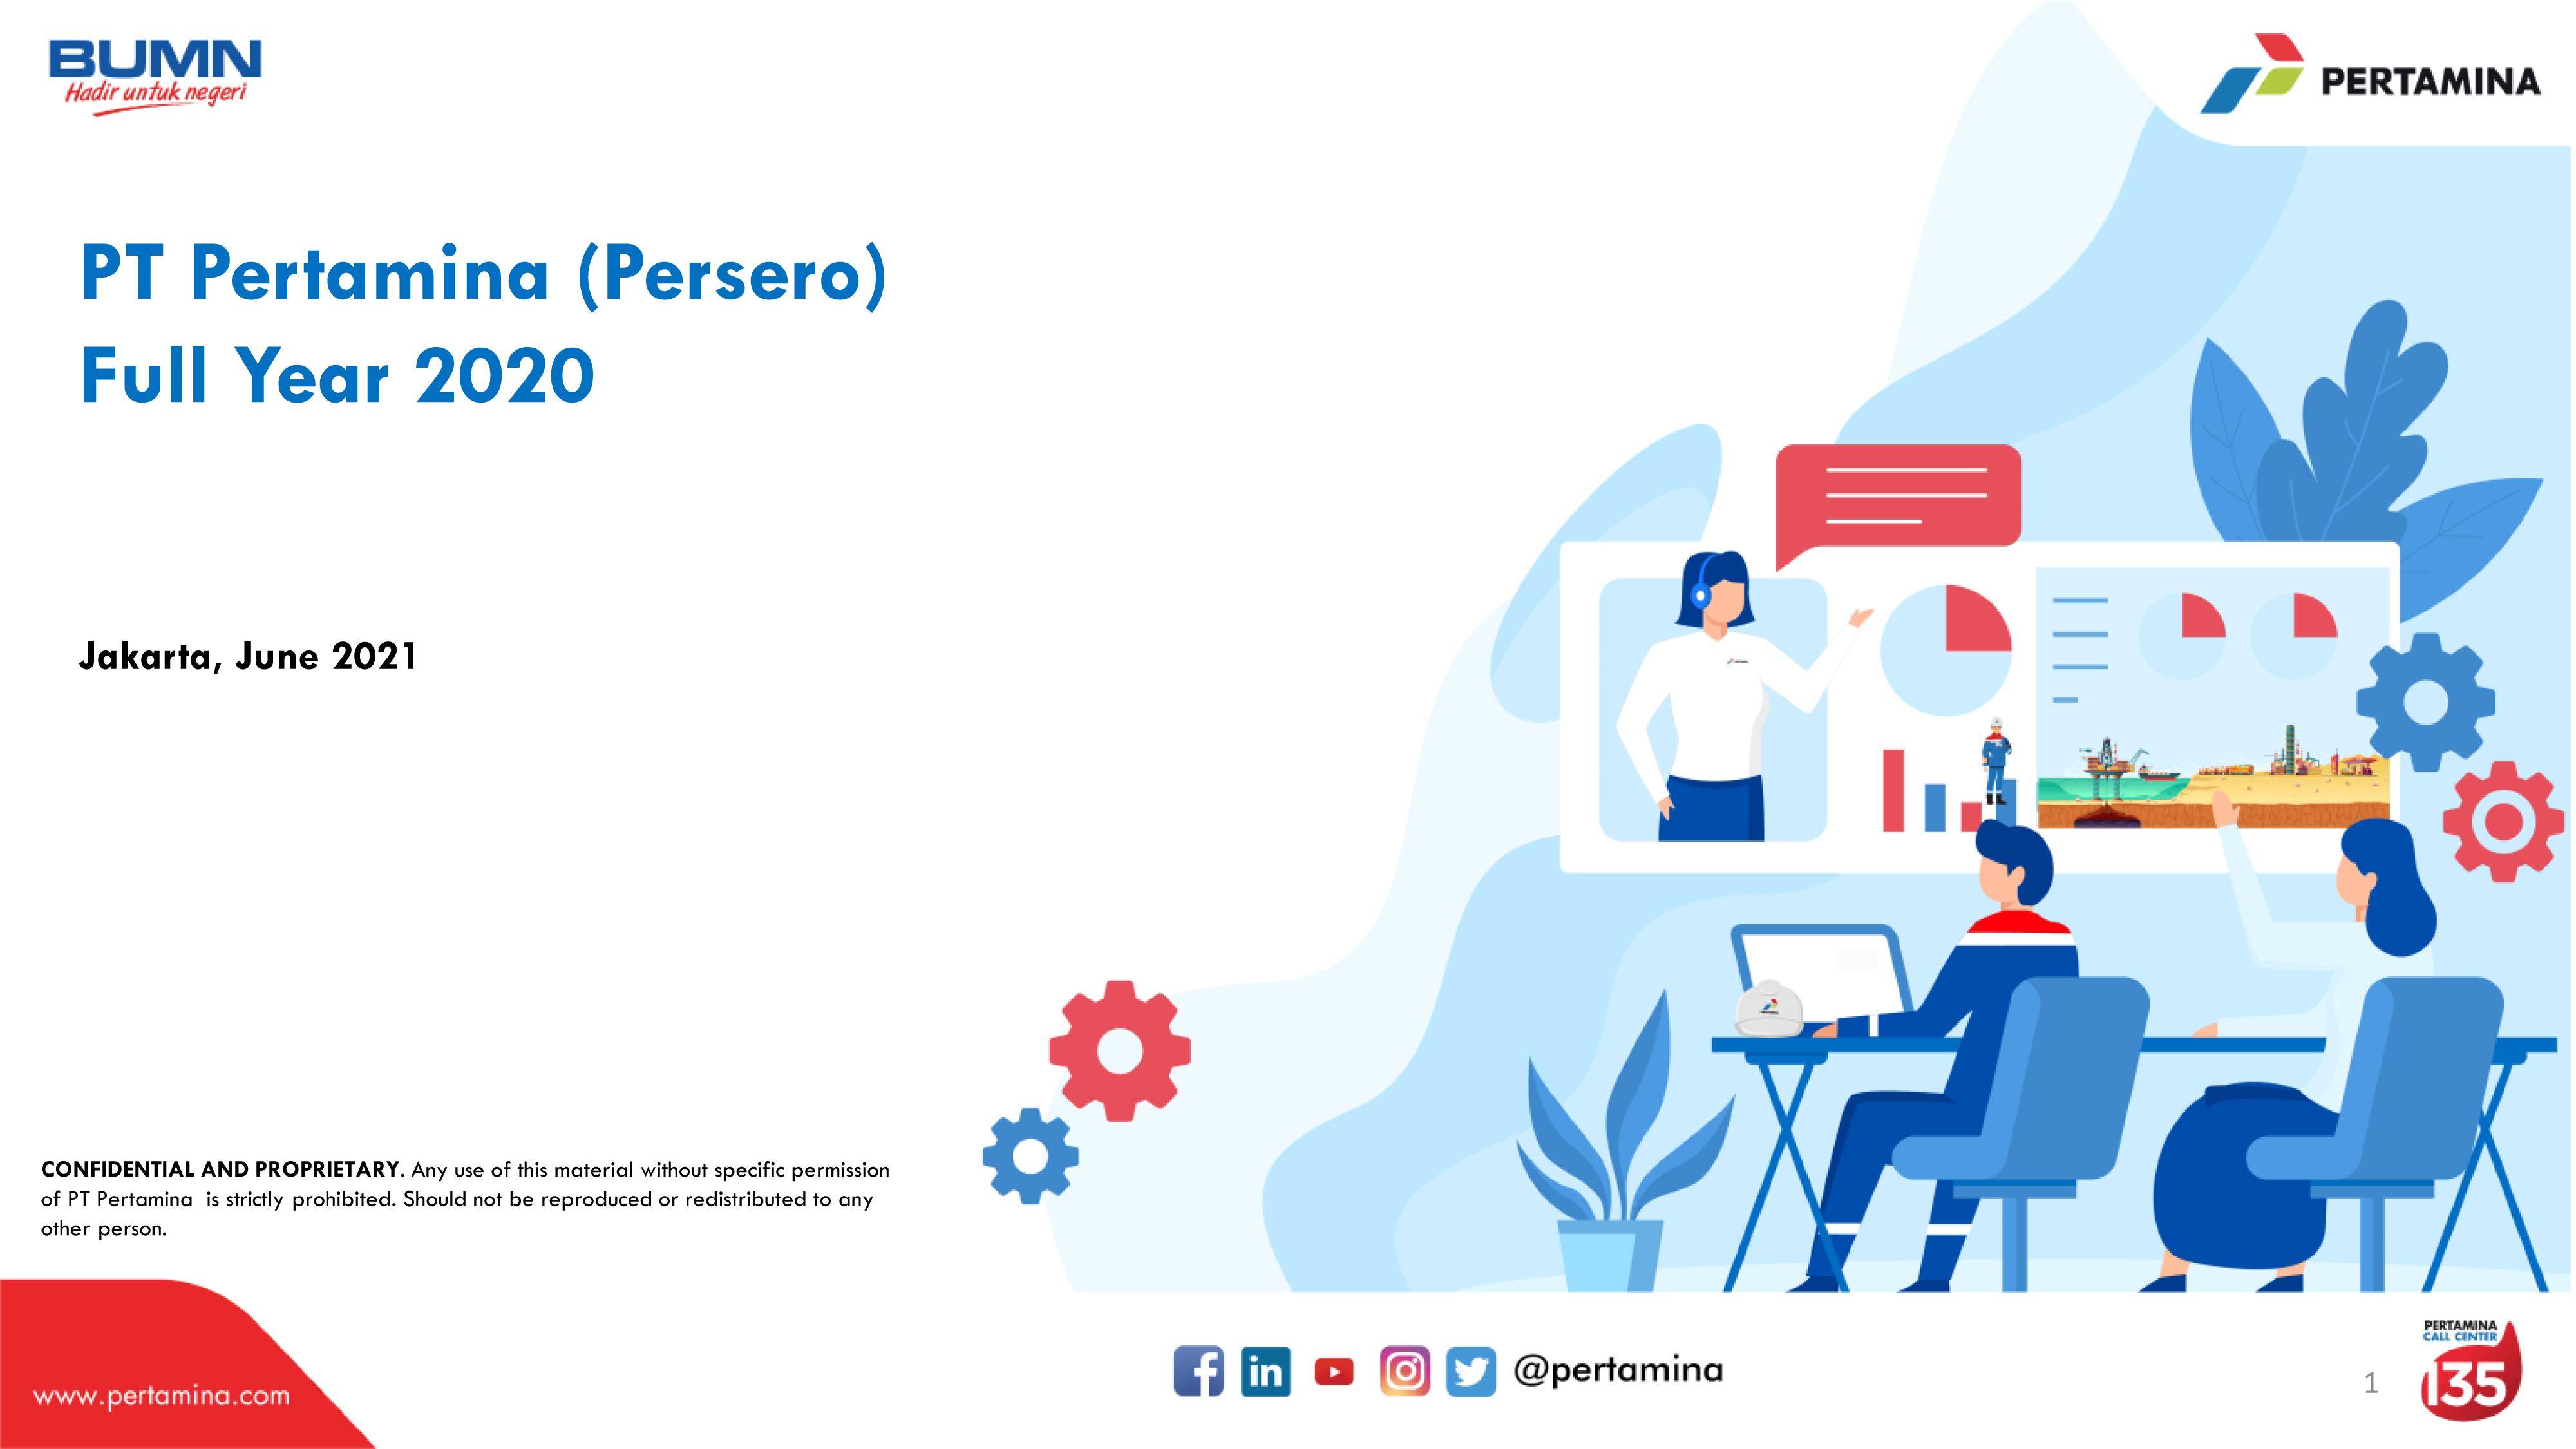 PT Pertamina (Persero) Full Year 2020 Performance